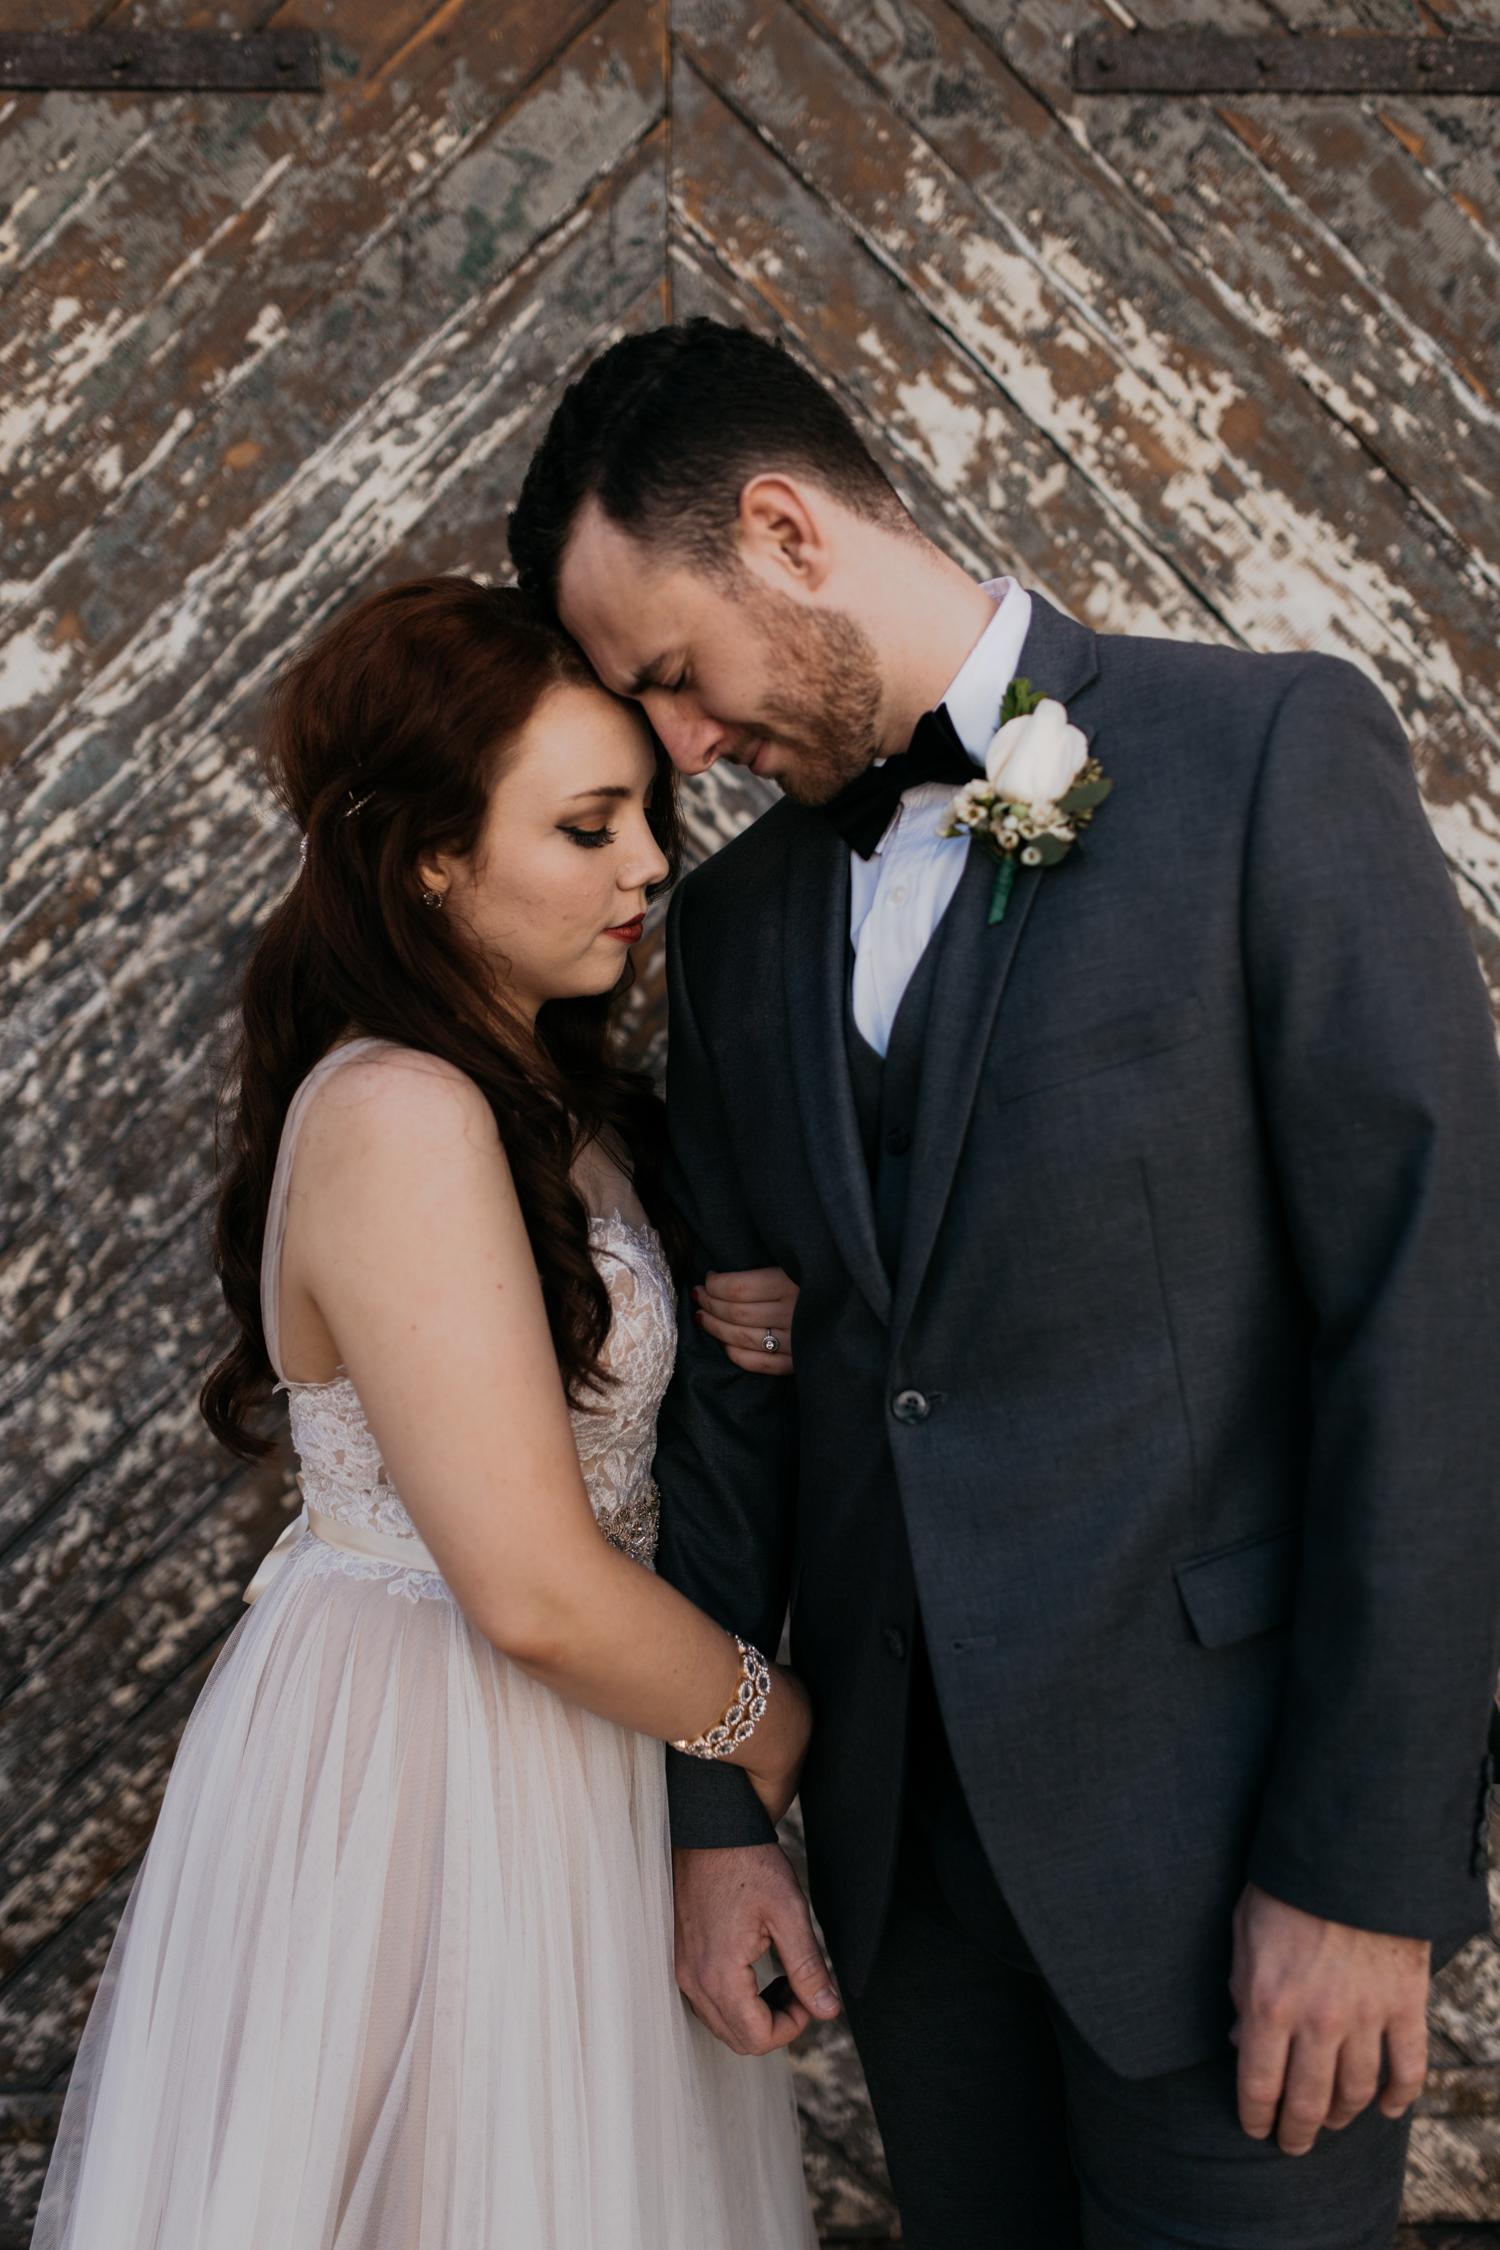 Yellow+Bird+Visuals+Destination+Wedding+Photographer-4903